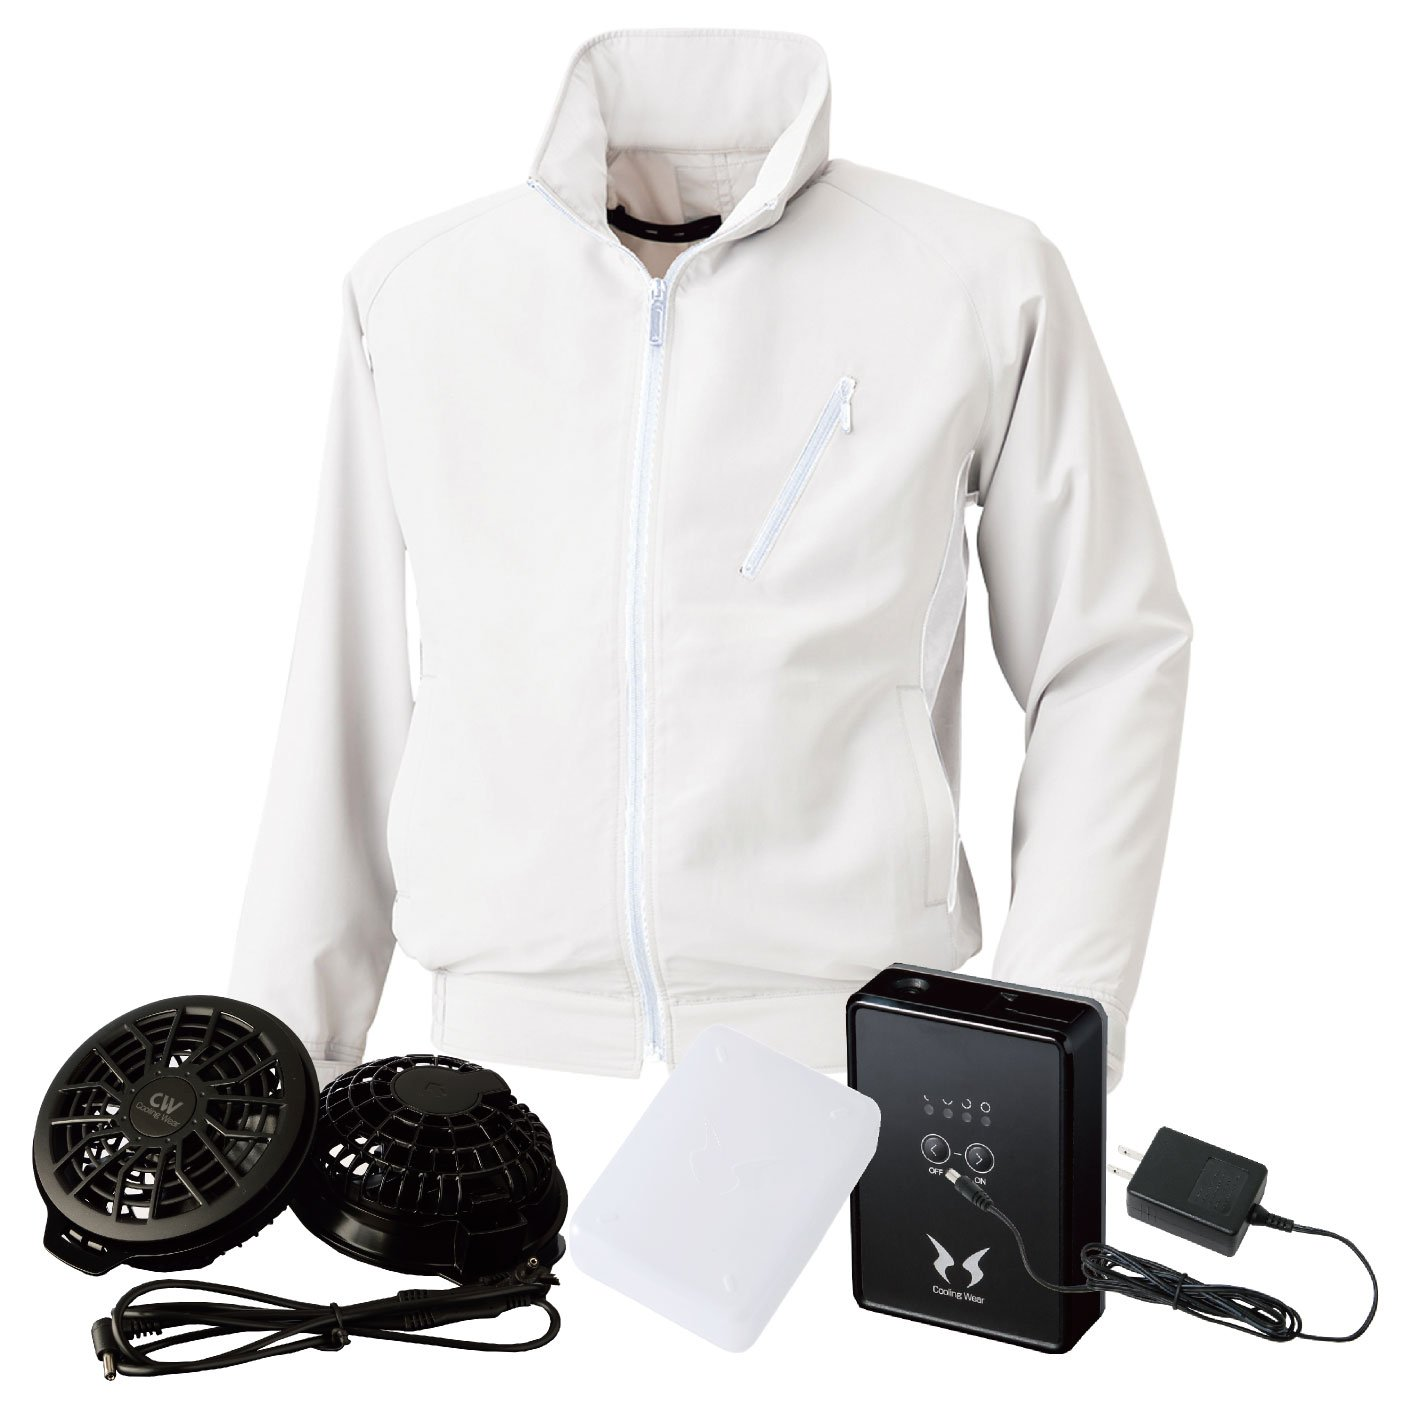 bigborn(ビッグボーン) 空調風神服 空調服 bb-bk6057-l 【空調服+ファン+バッテリー】 B07CSBWYRK 5L|ホワイト ホワイト 5L